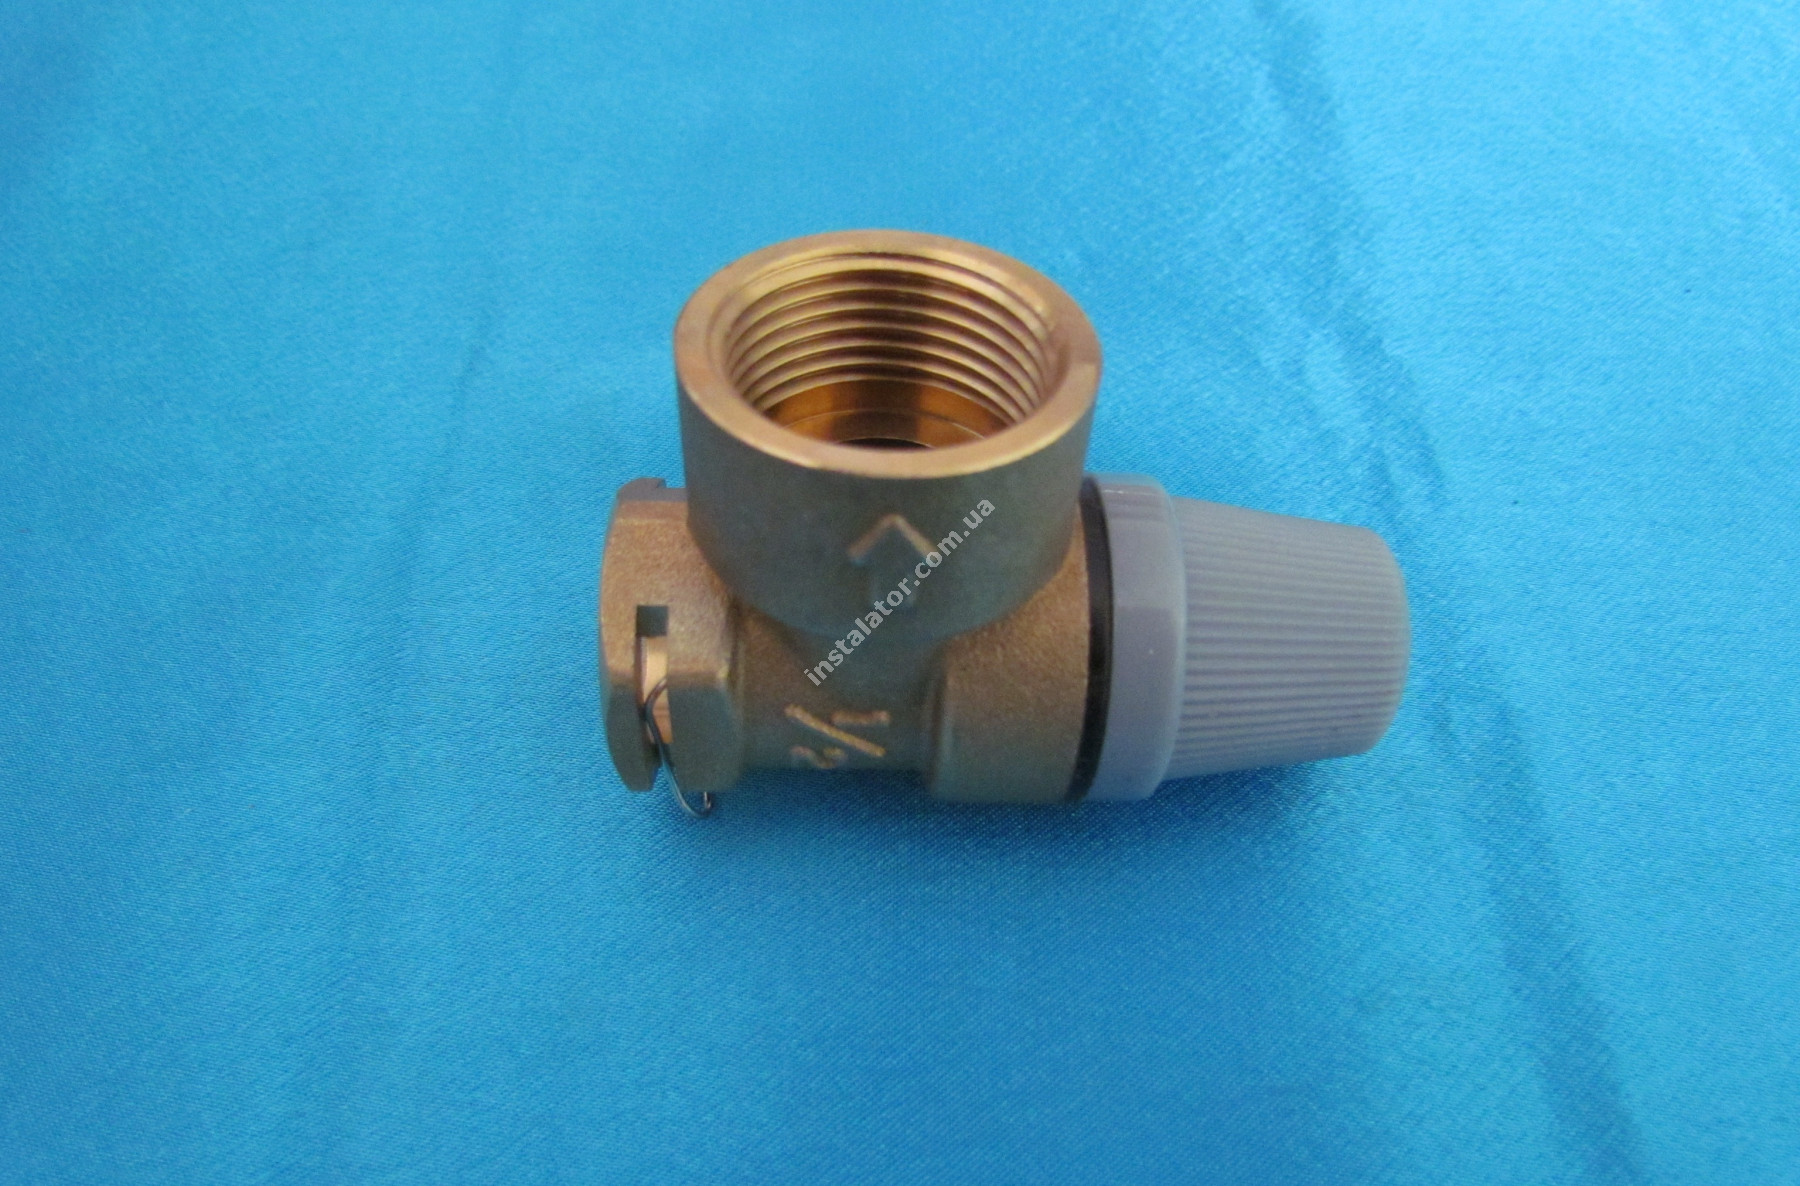 190732 Запобіжний клапан  VAILLANT Pro/Plus 3 bar full-image-1